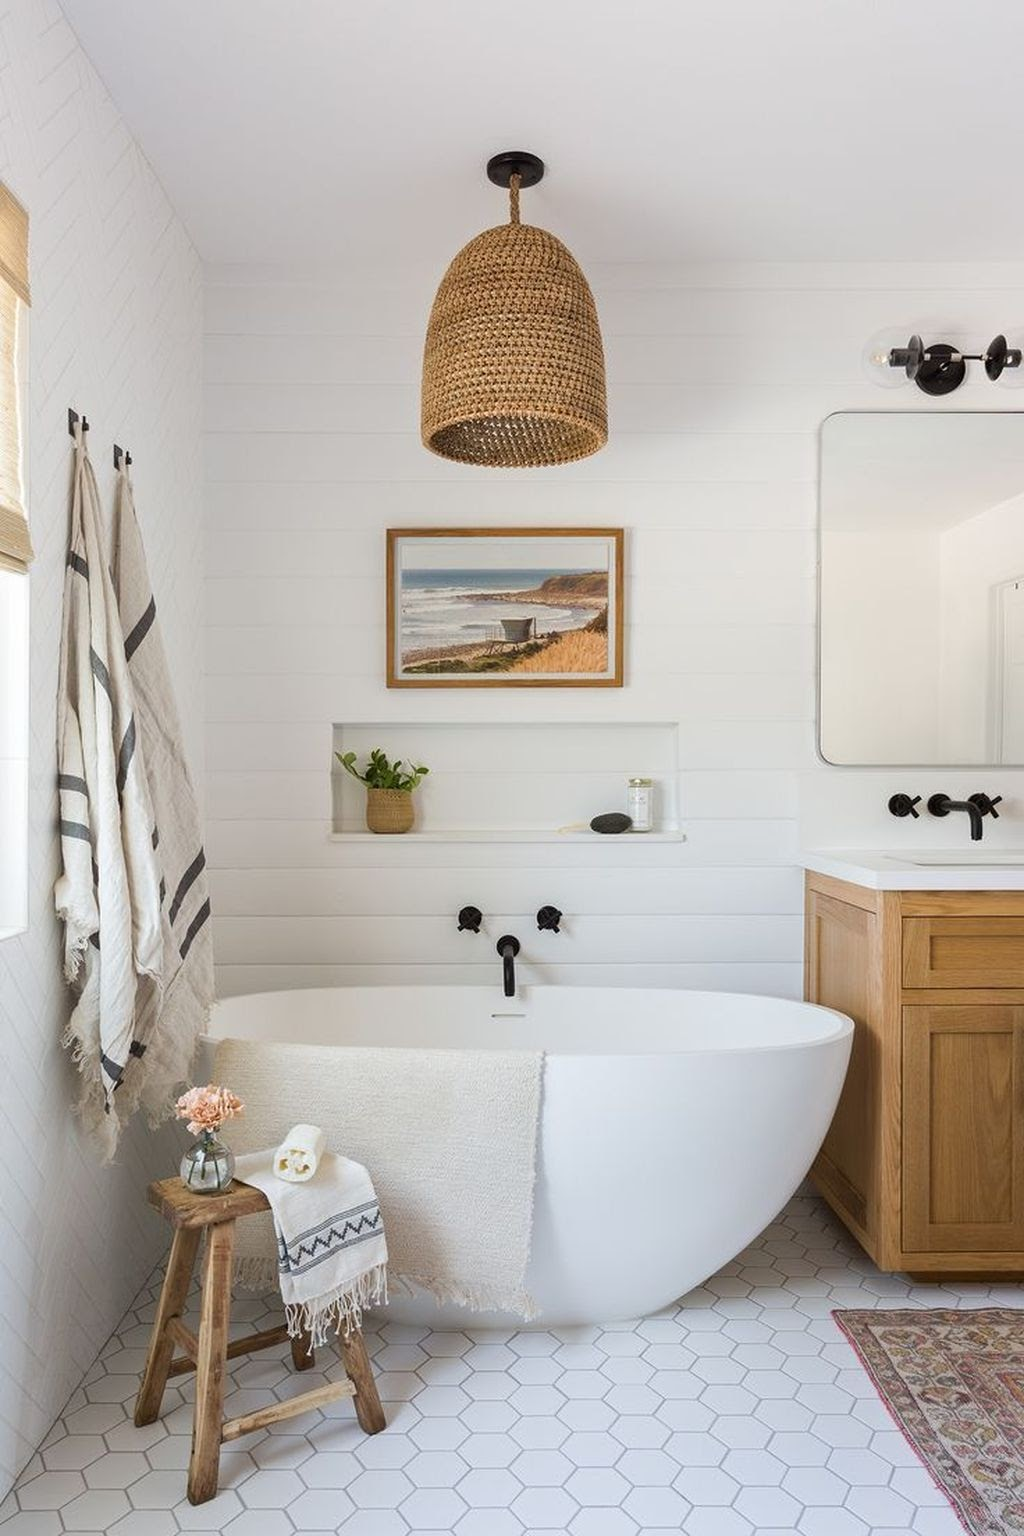 banheiro amplo e iluminado